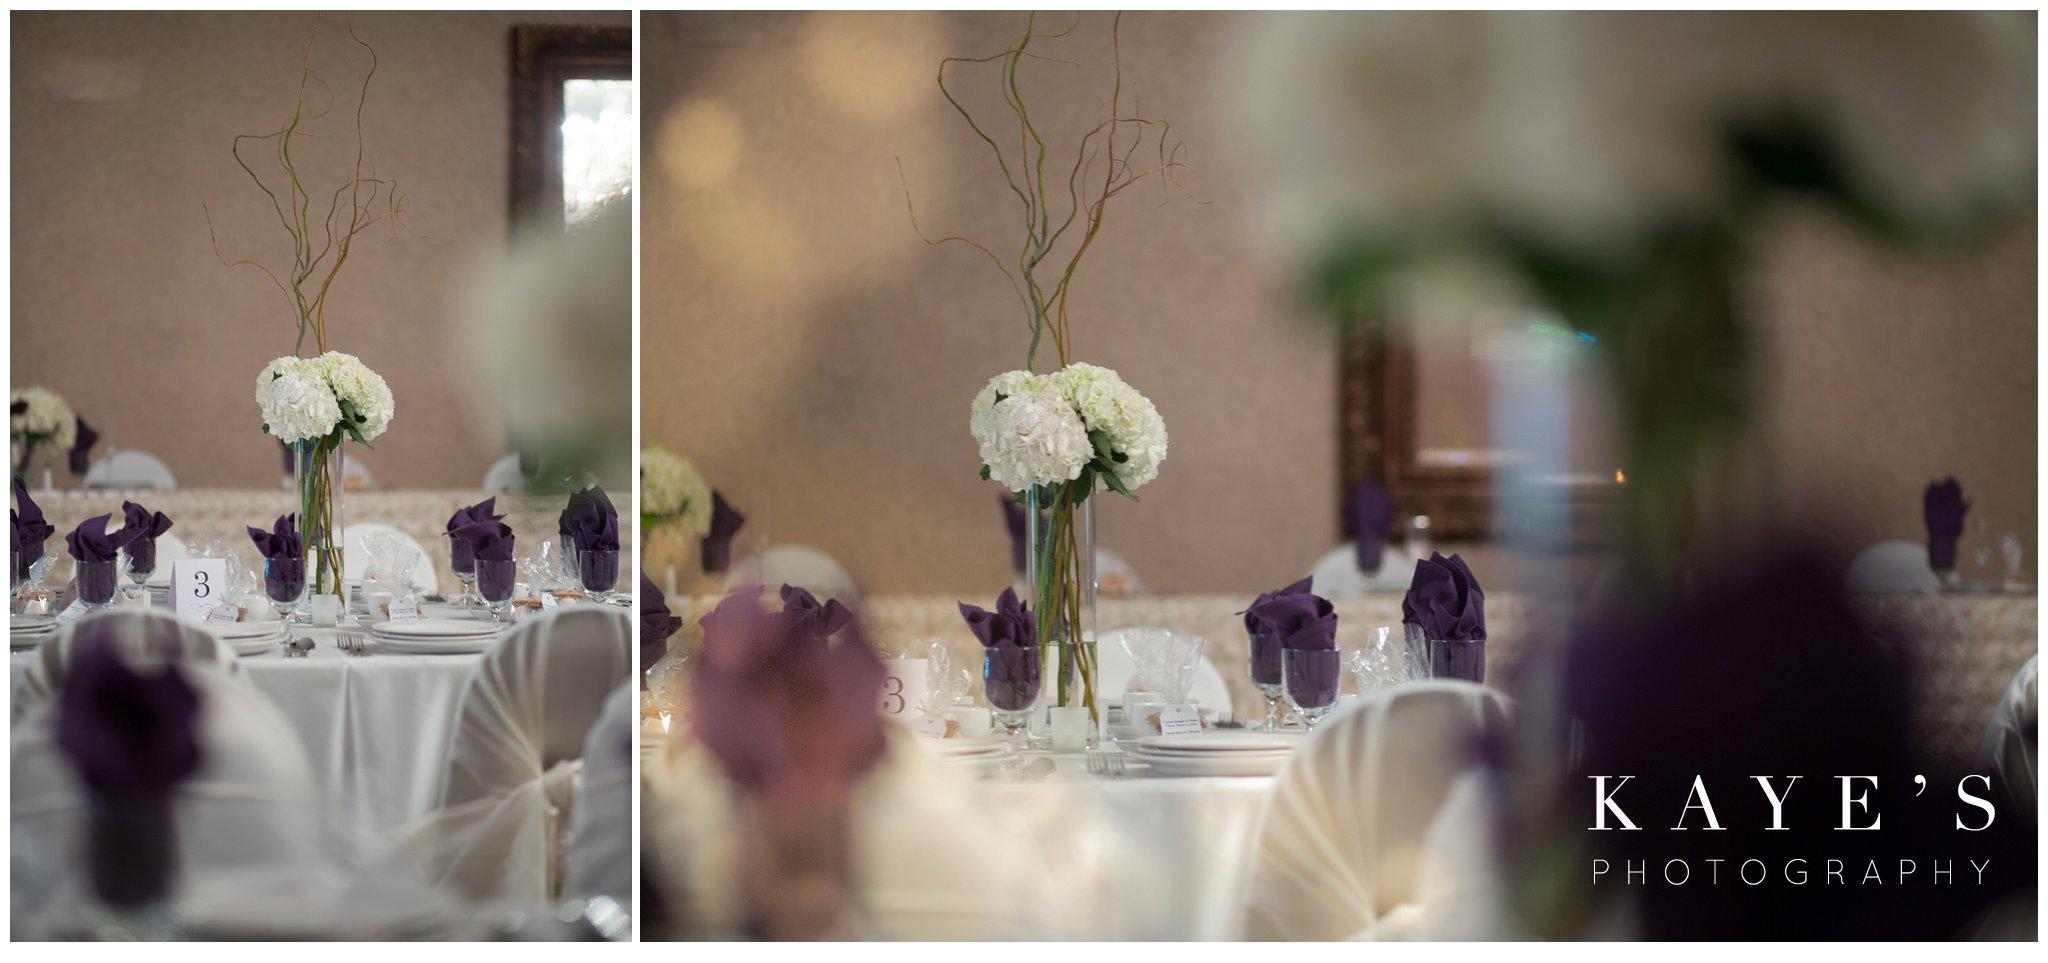 Kayes Photography- howell-michigan-wedding-photographer_0636.jpg